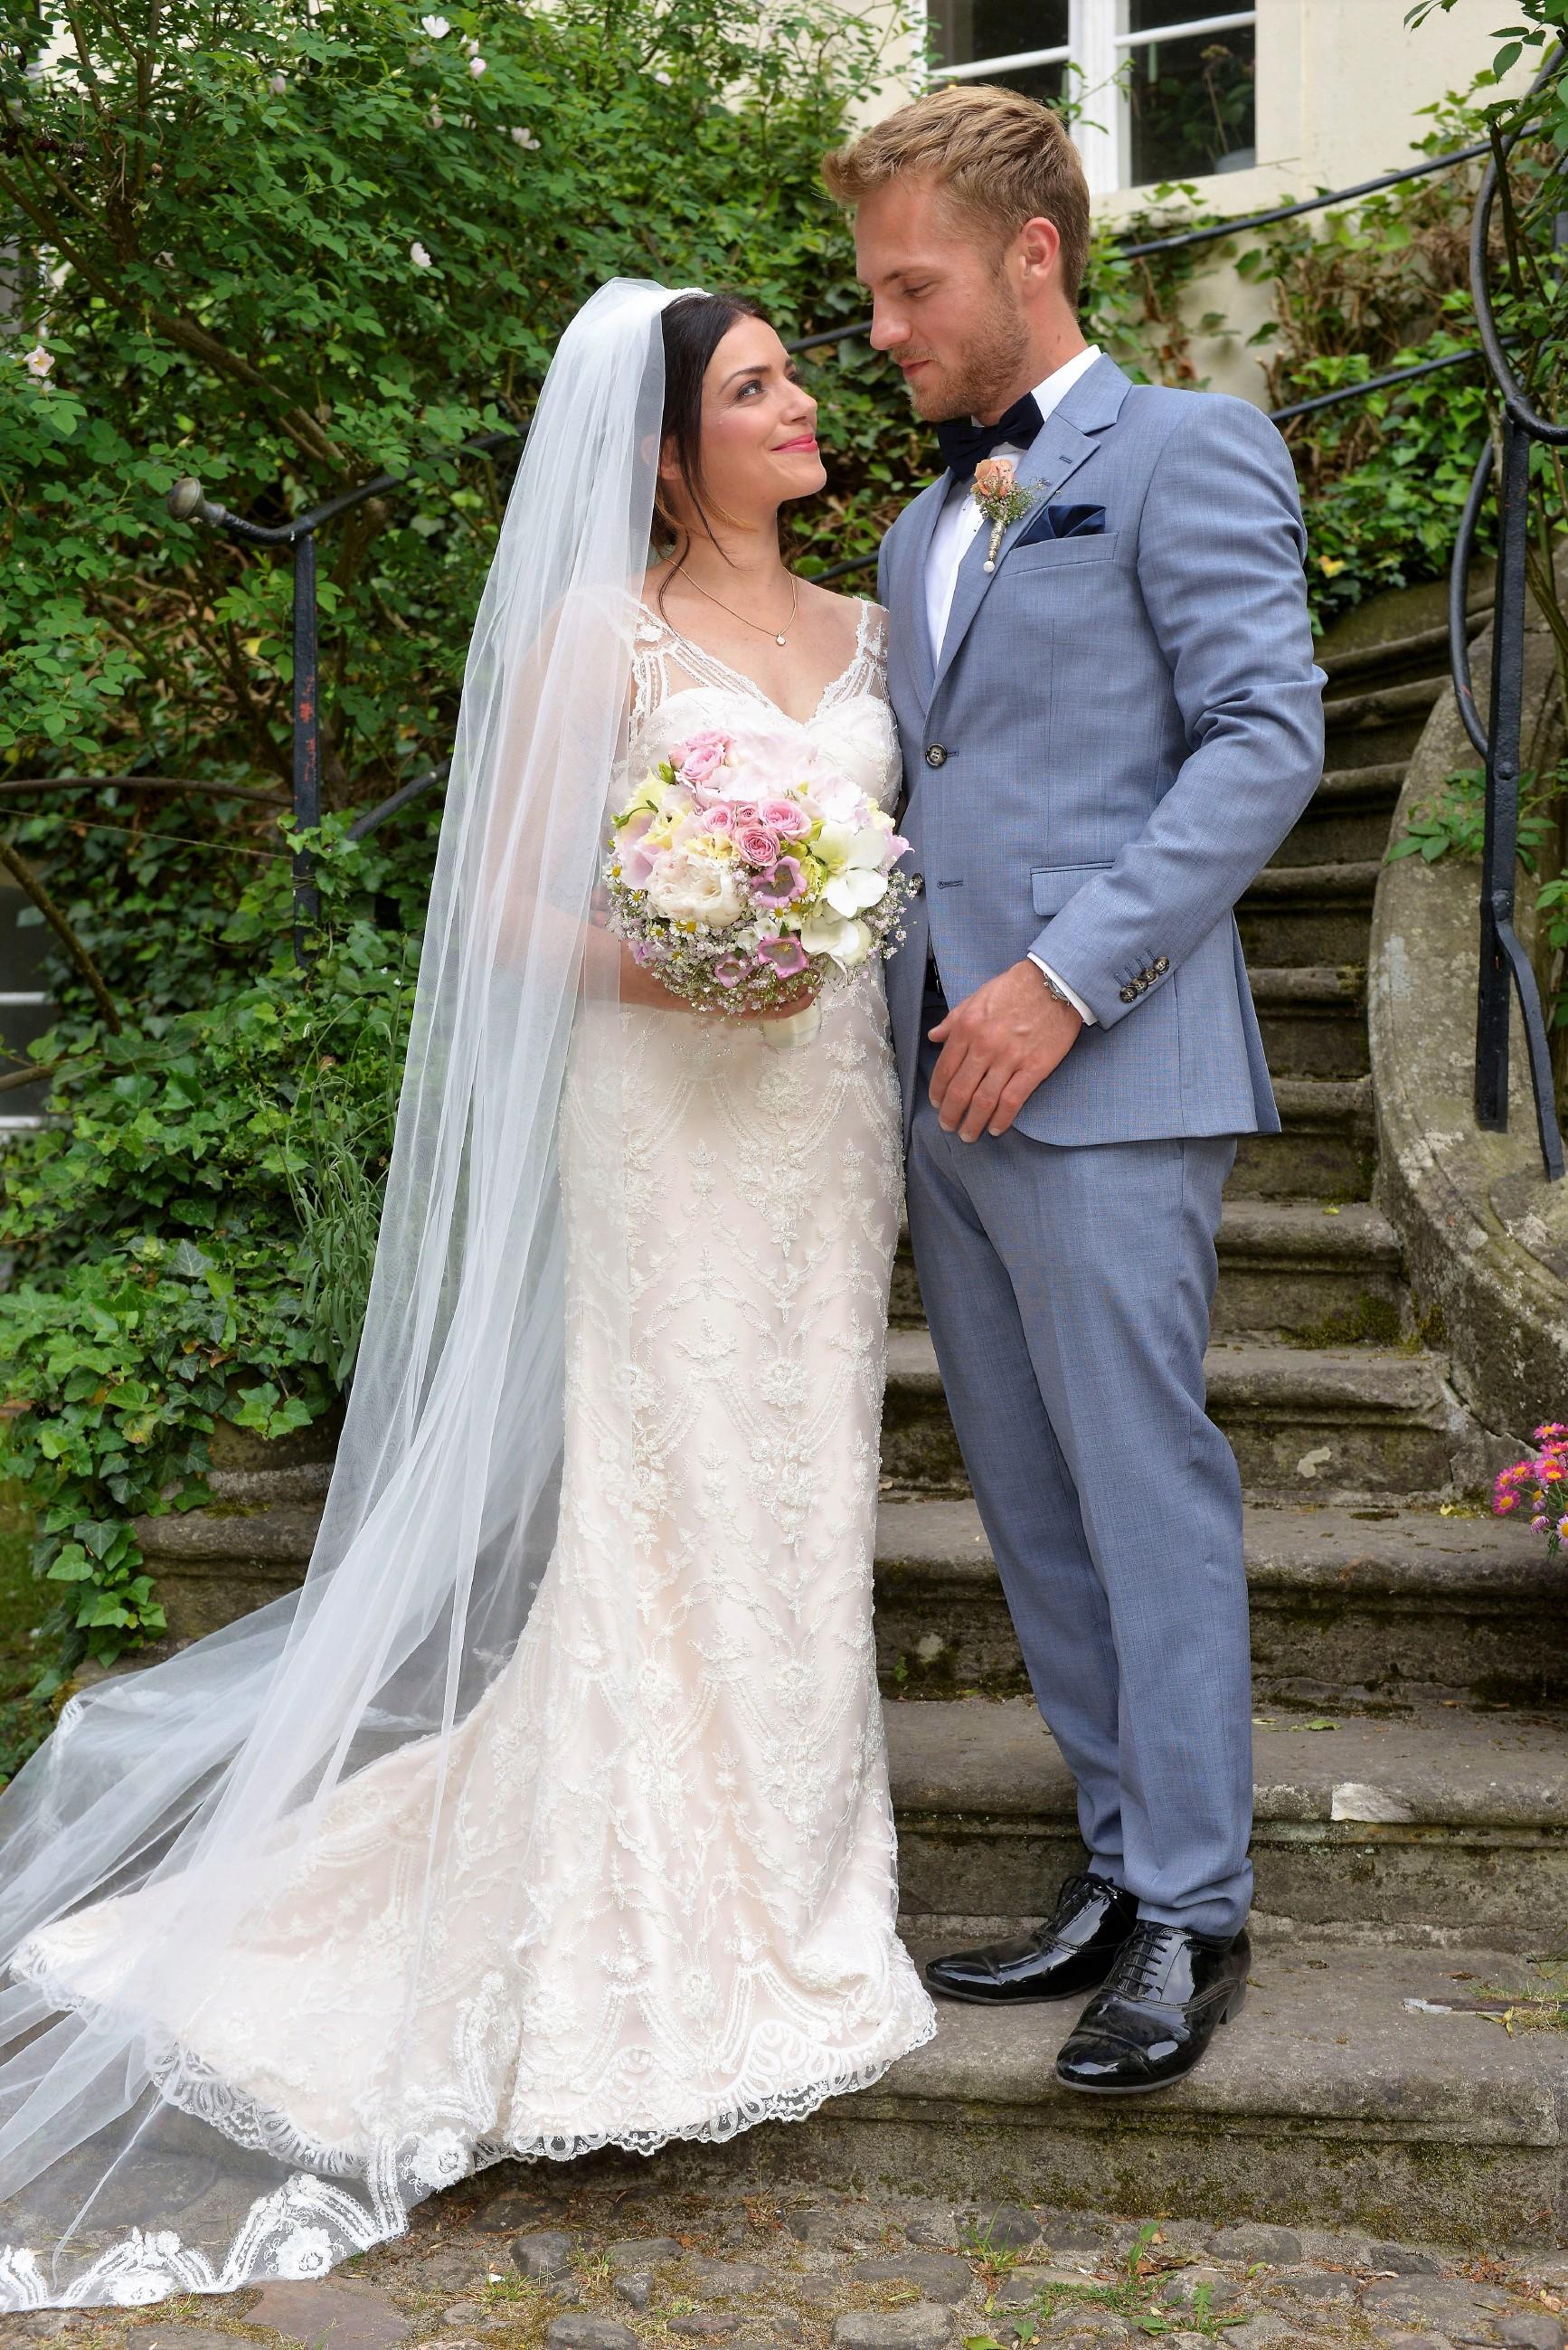 Neue GZSZ-Braut: Das sagt Valentina Pahde dazu